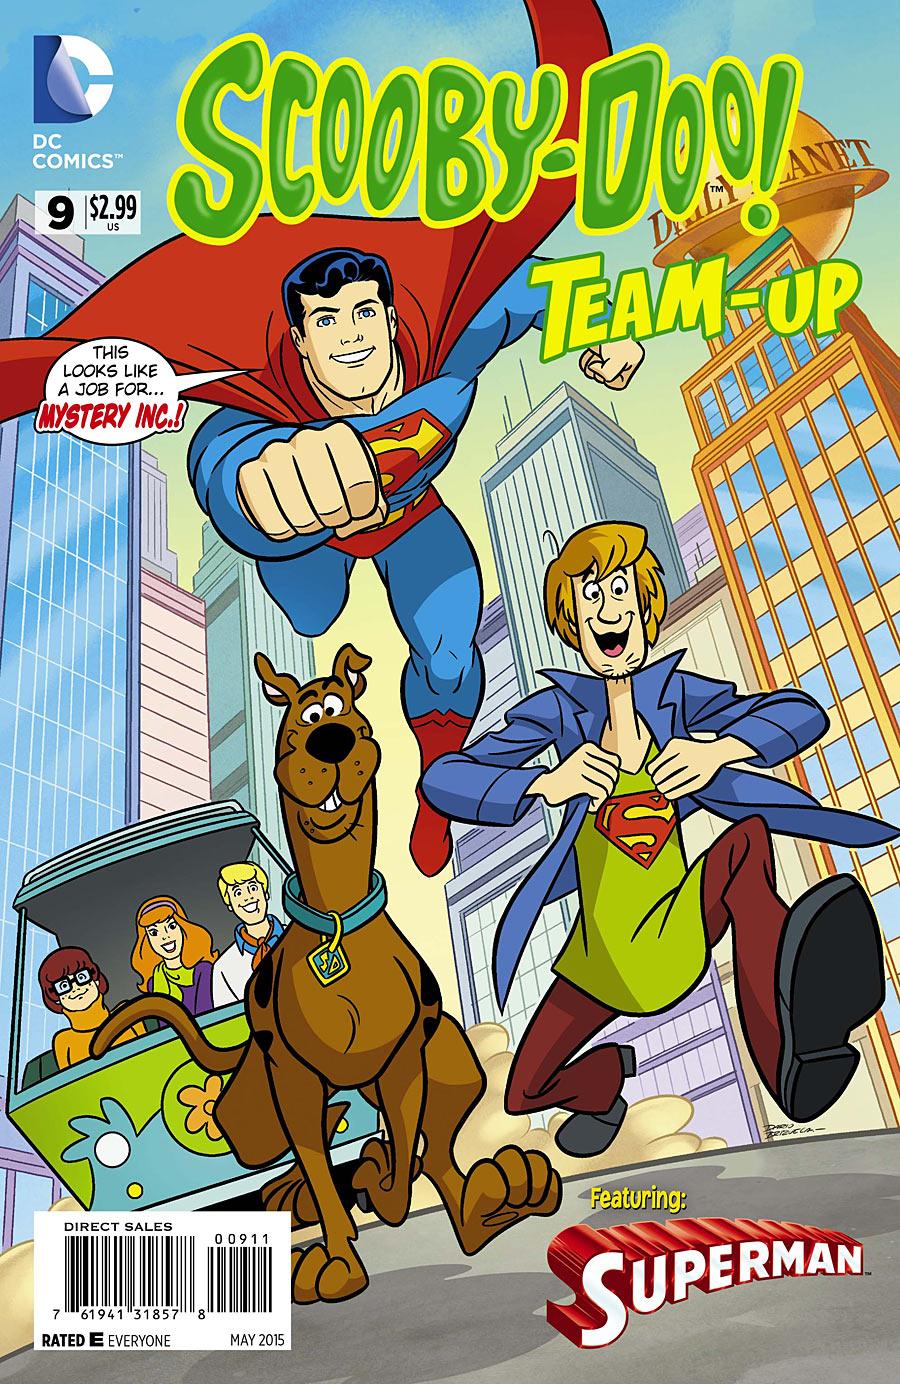 Scooby-Doo! Team-Up issue 9   Scoobypedia   FANDOM powered ...